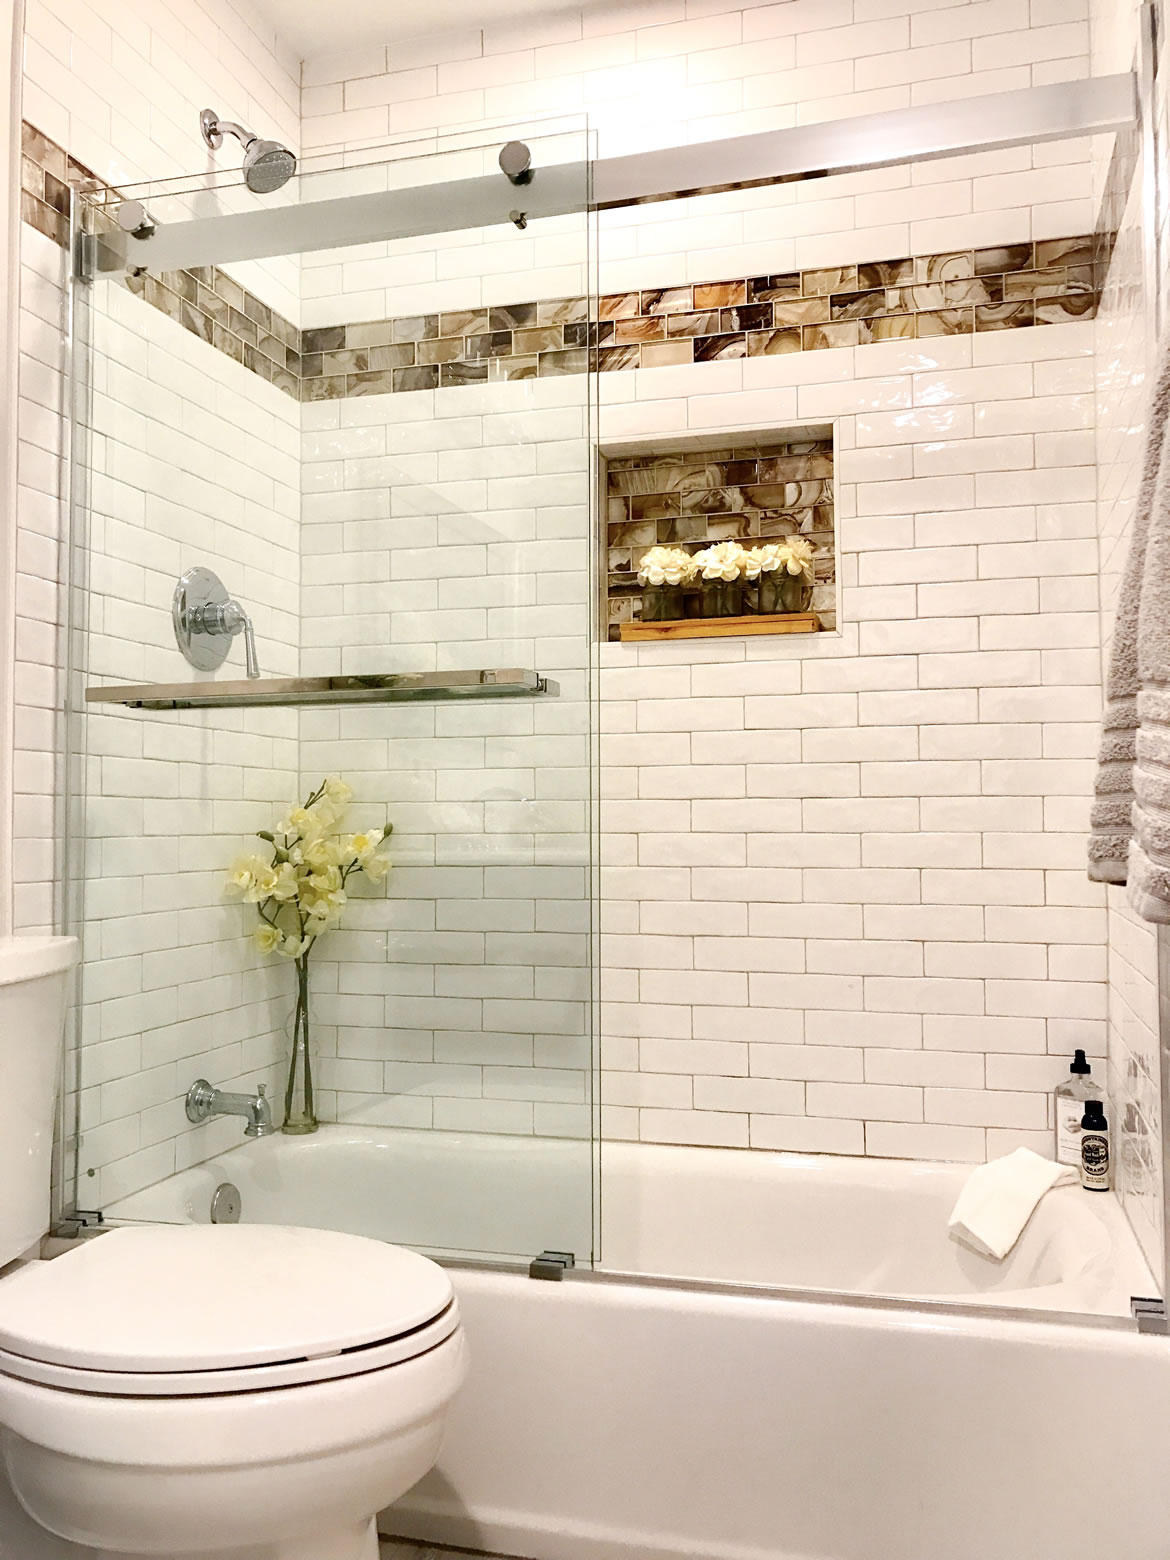 Bathroom Remodel - Building By Design - NoVA Kitchen-Bathroom ...